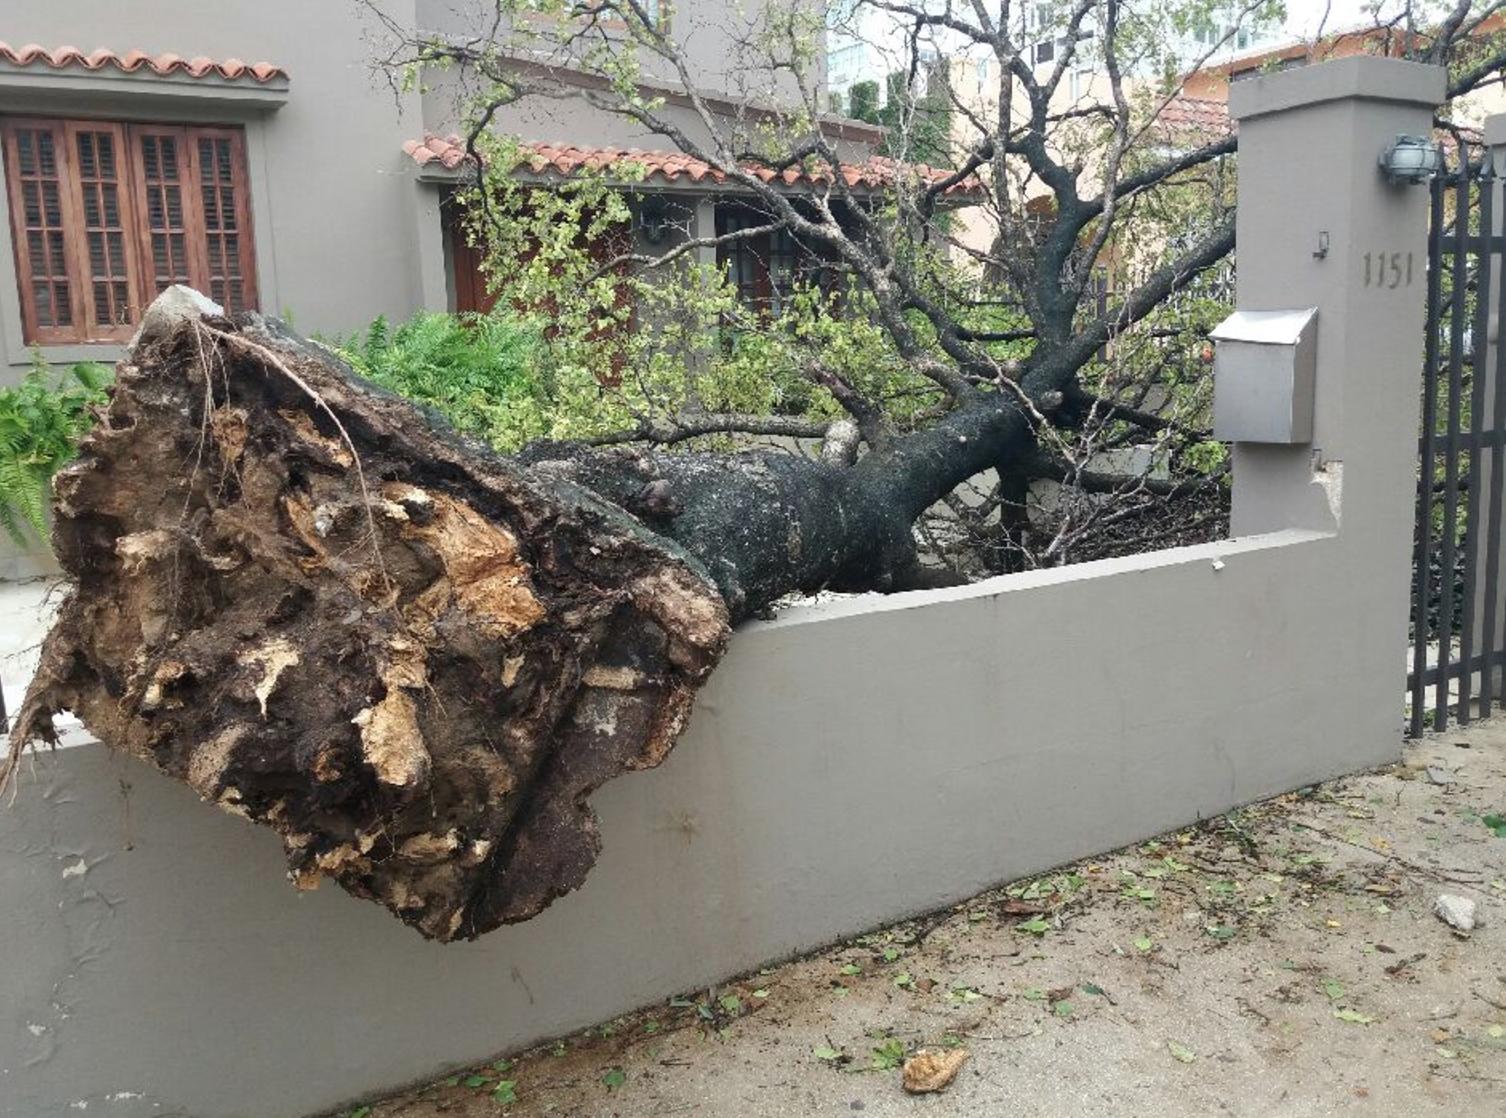 Trees Down In Puerto Rico From Hurricane Irma Photo: Rachel Gikas, Condado